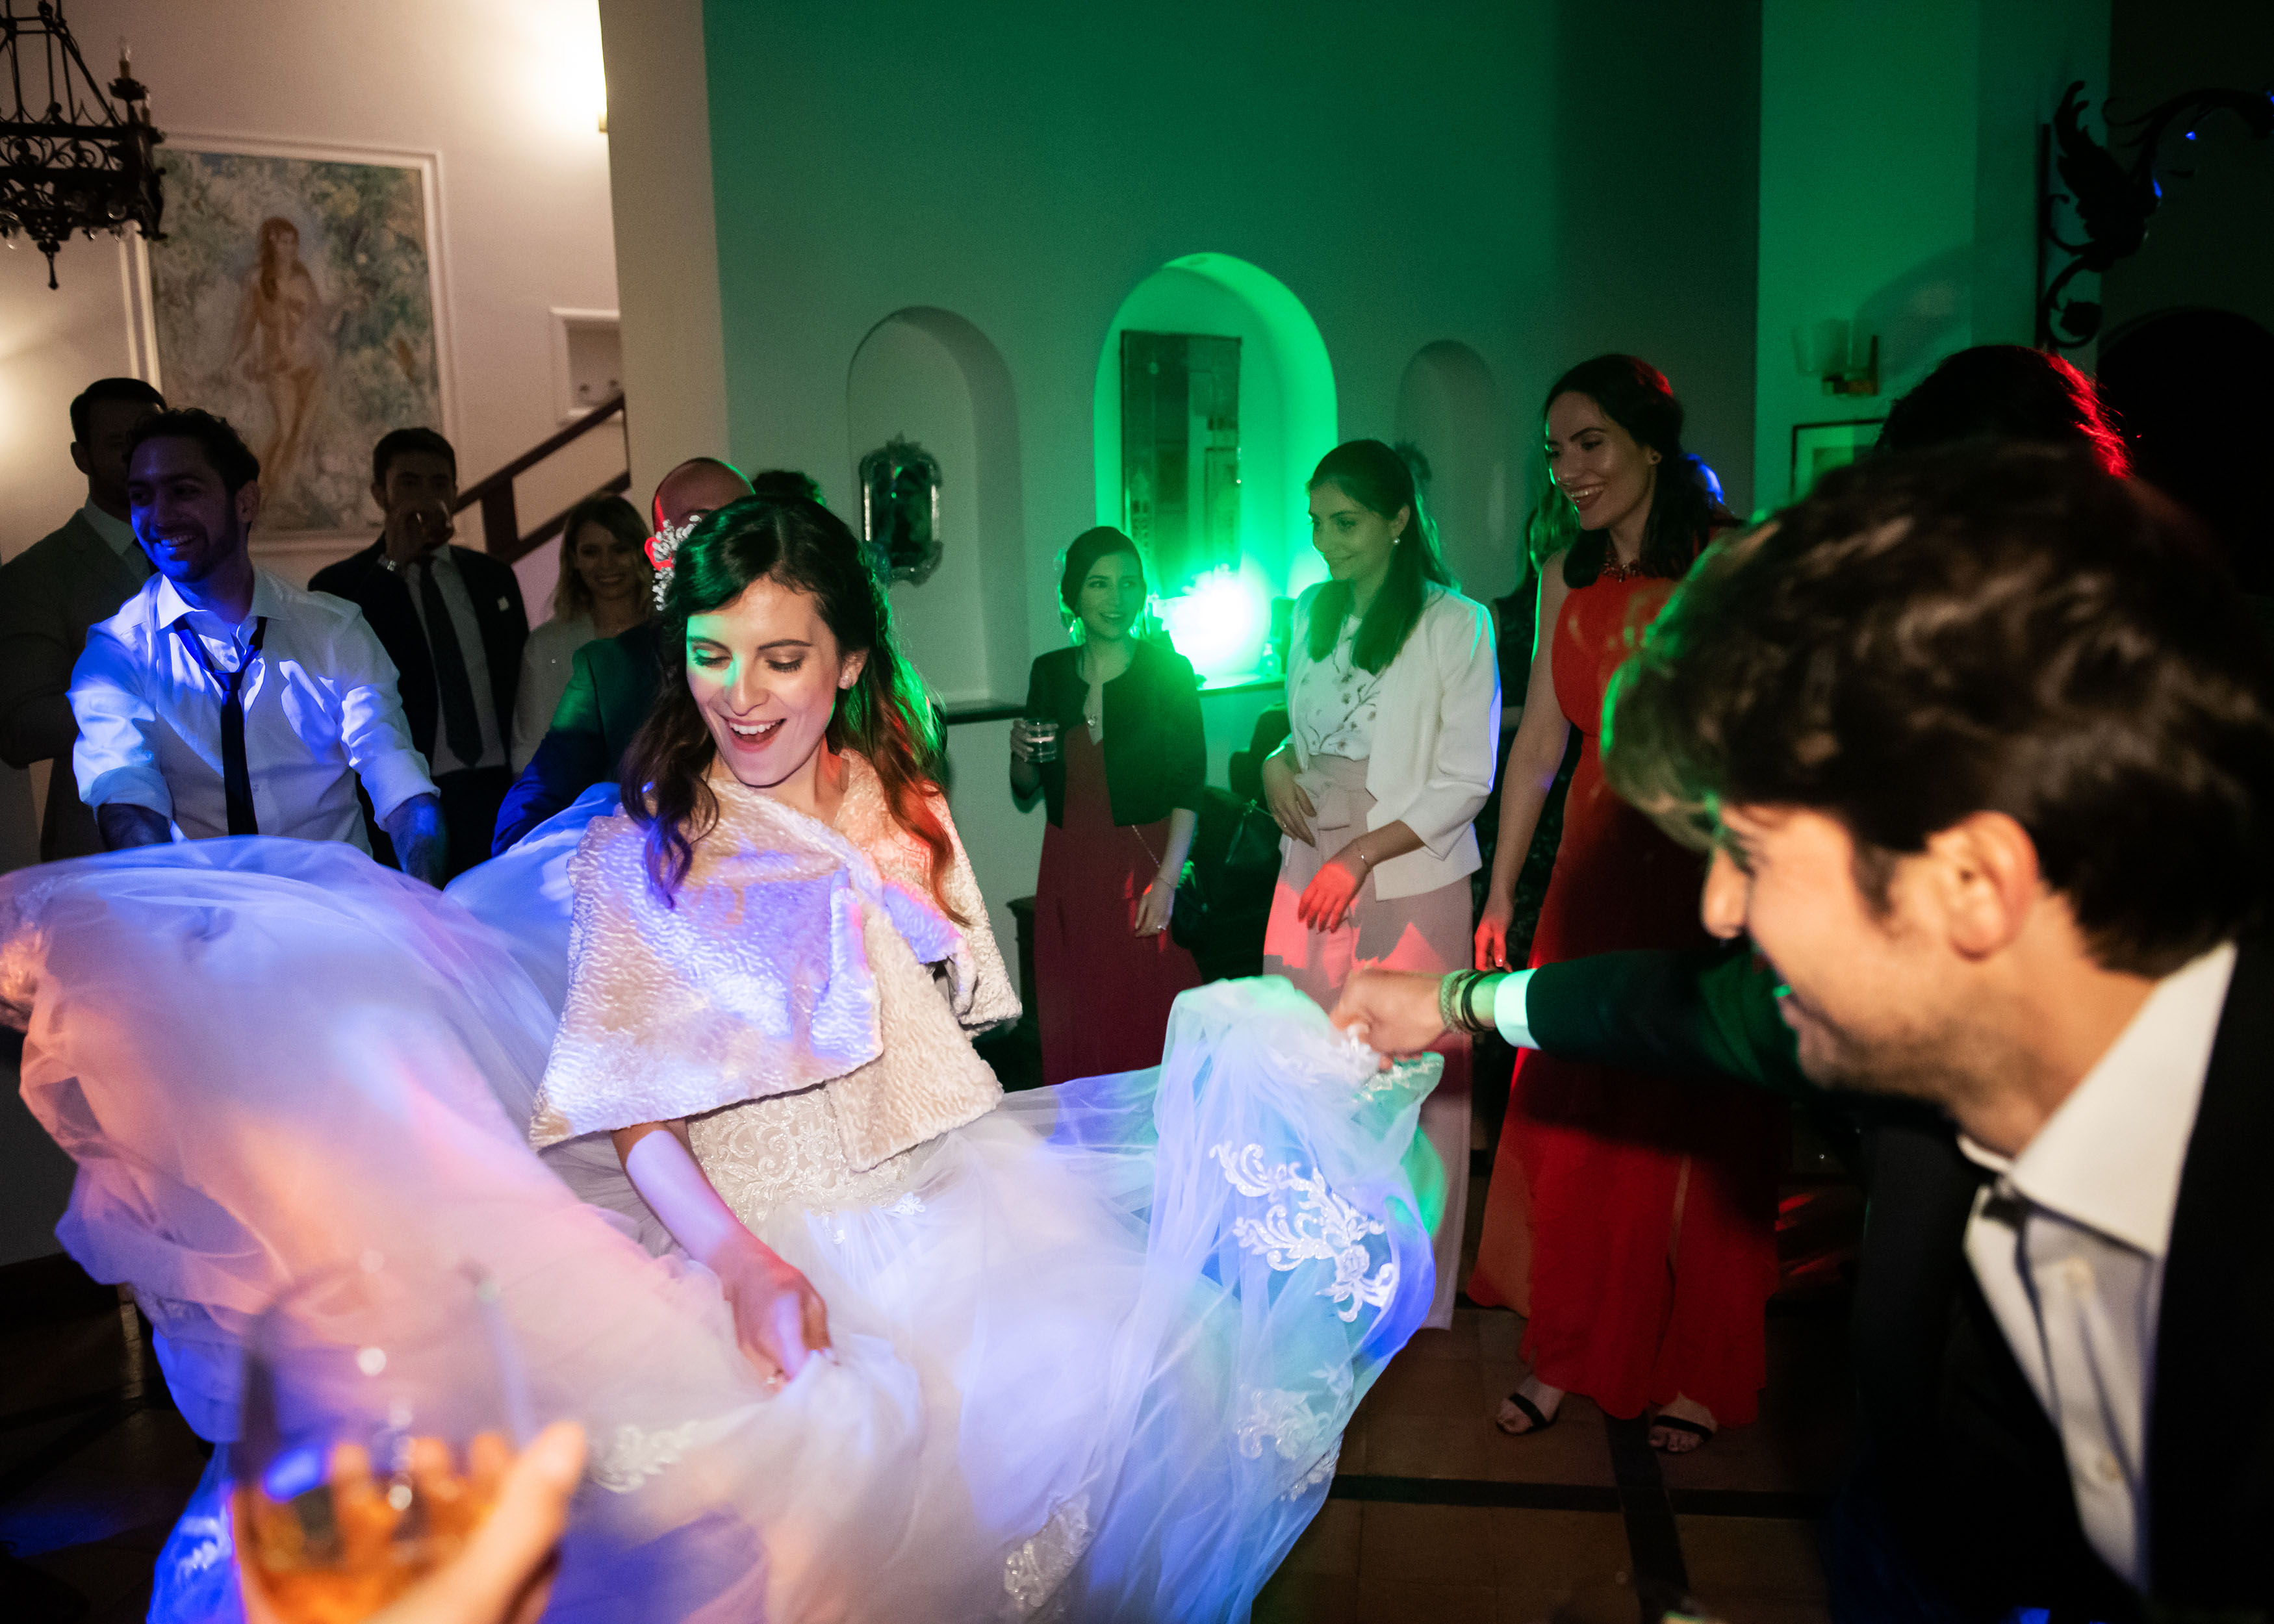 http://www.weddingamalfi.com/wp-content/uploads/Katia-Jorge-18-maggio-2019-45.jpg